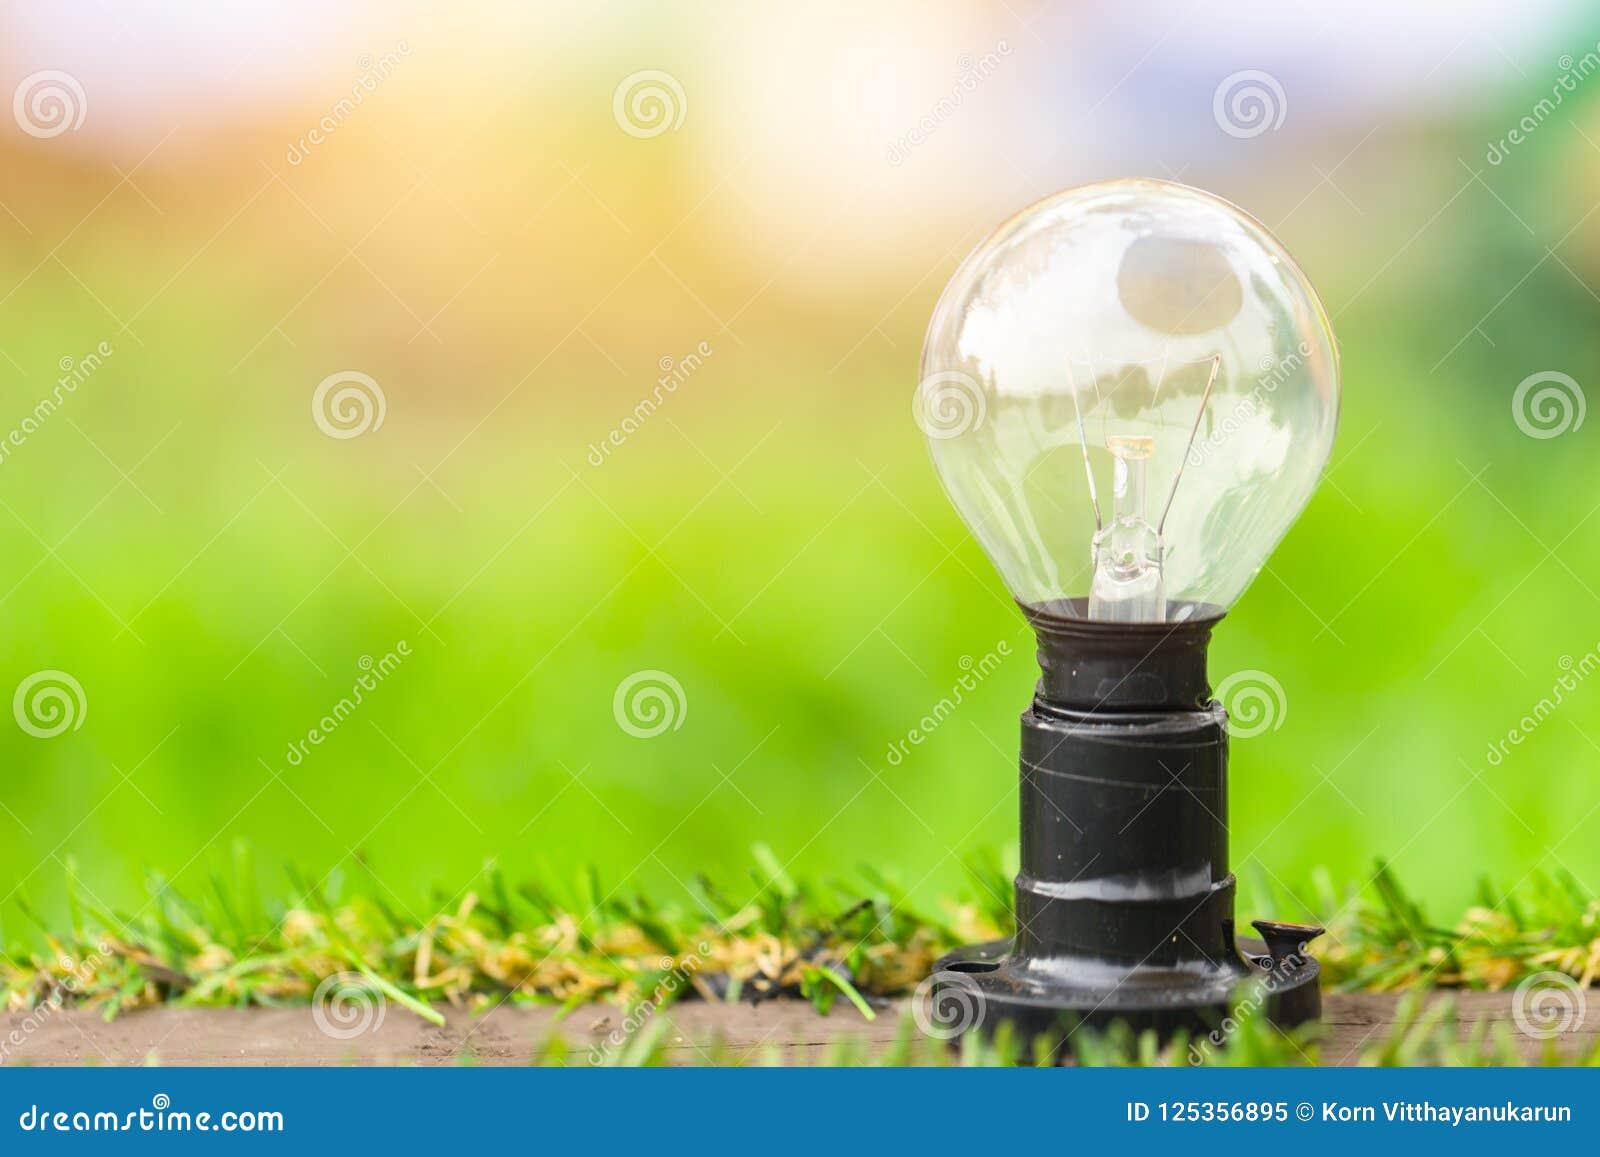 Green energy concept light bulb on grass field